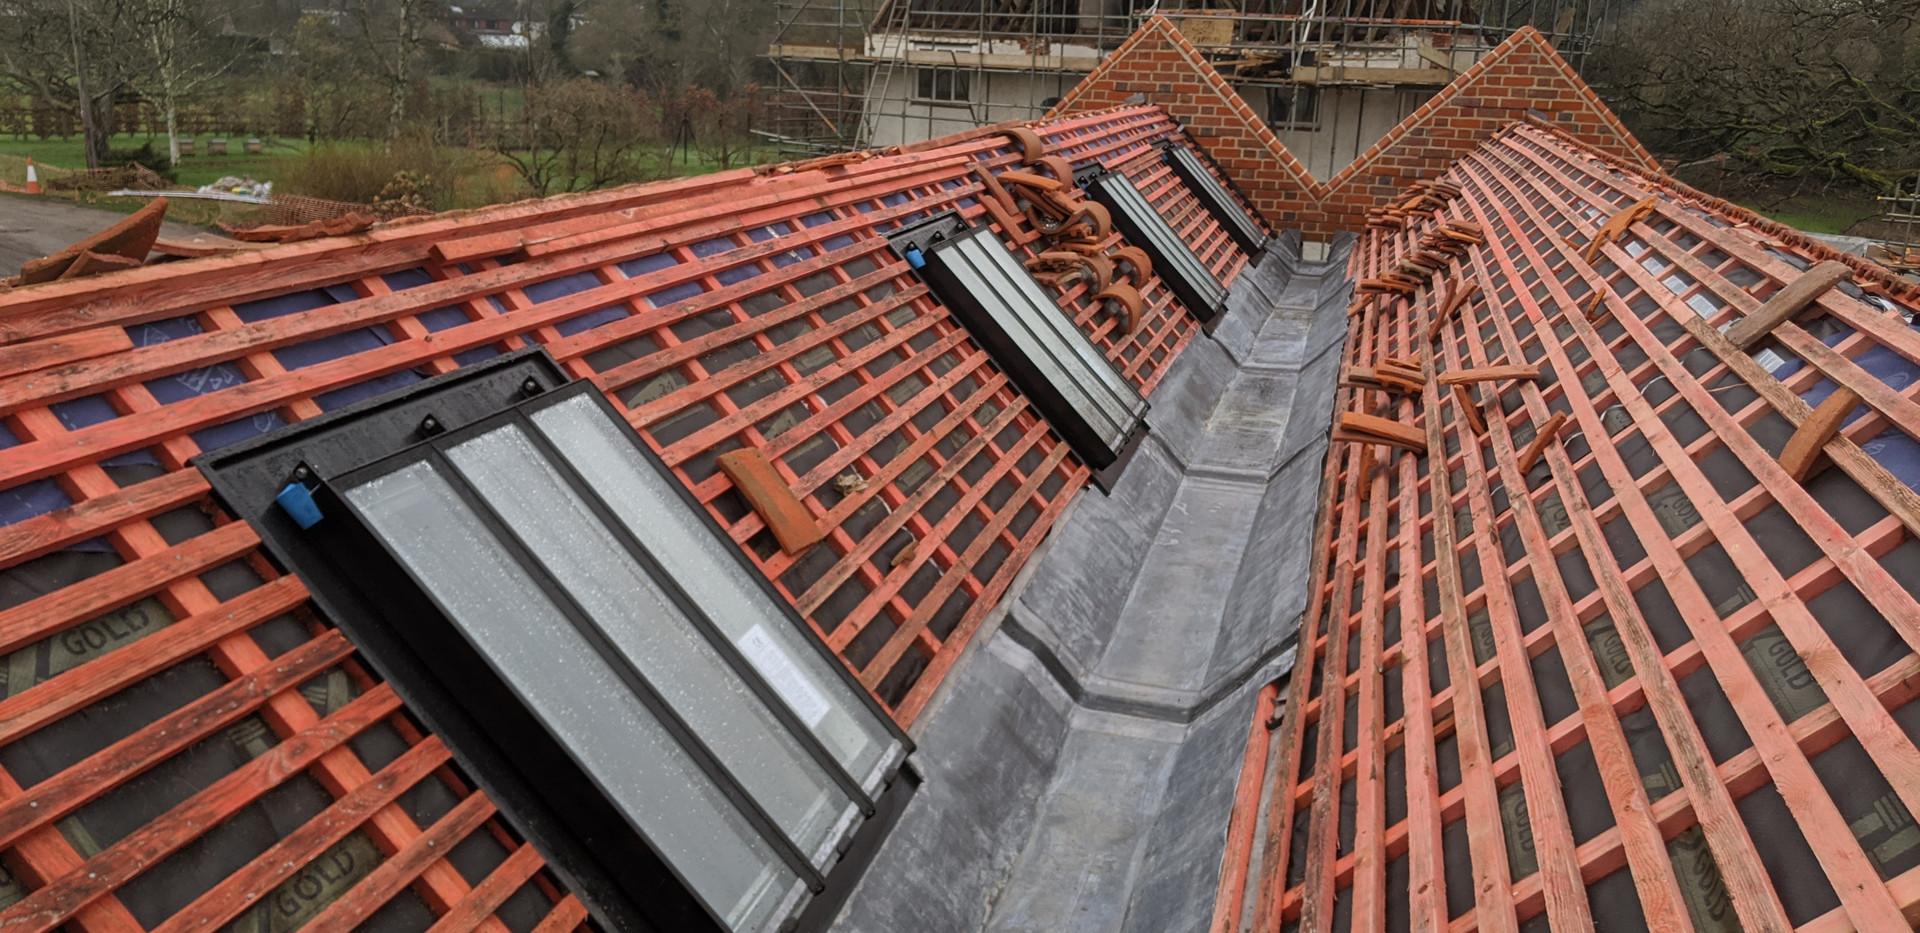 Roof battening and skylight